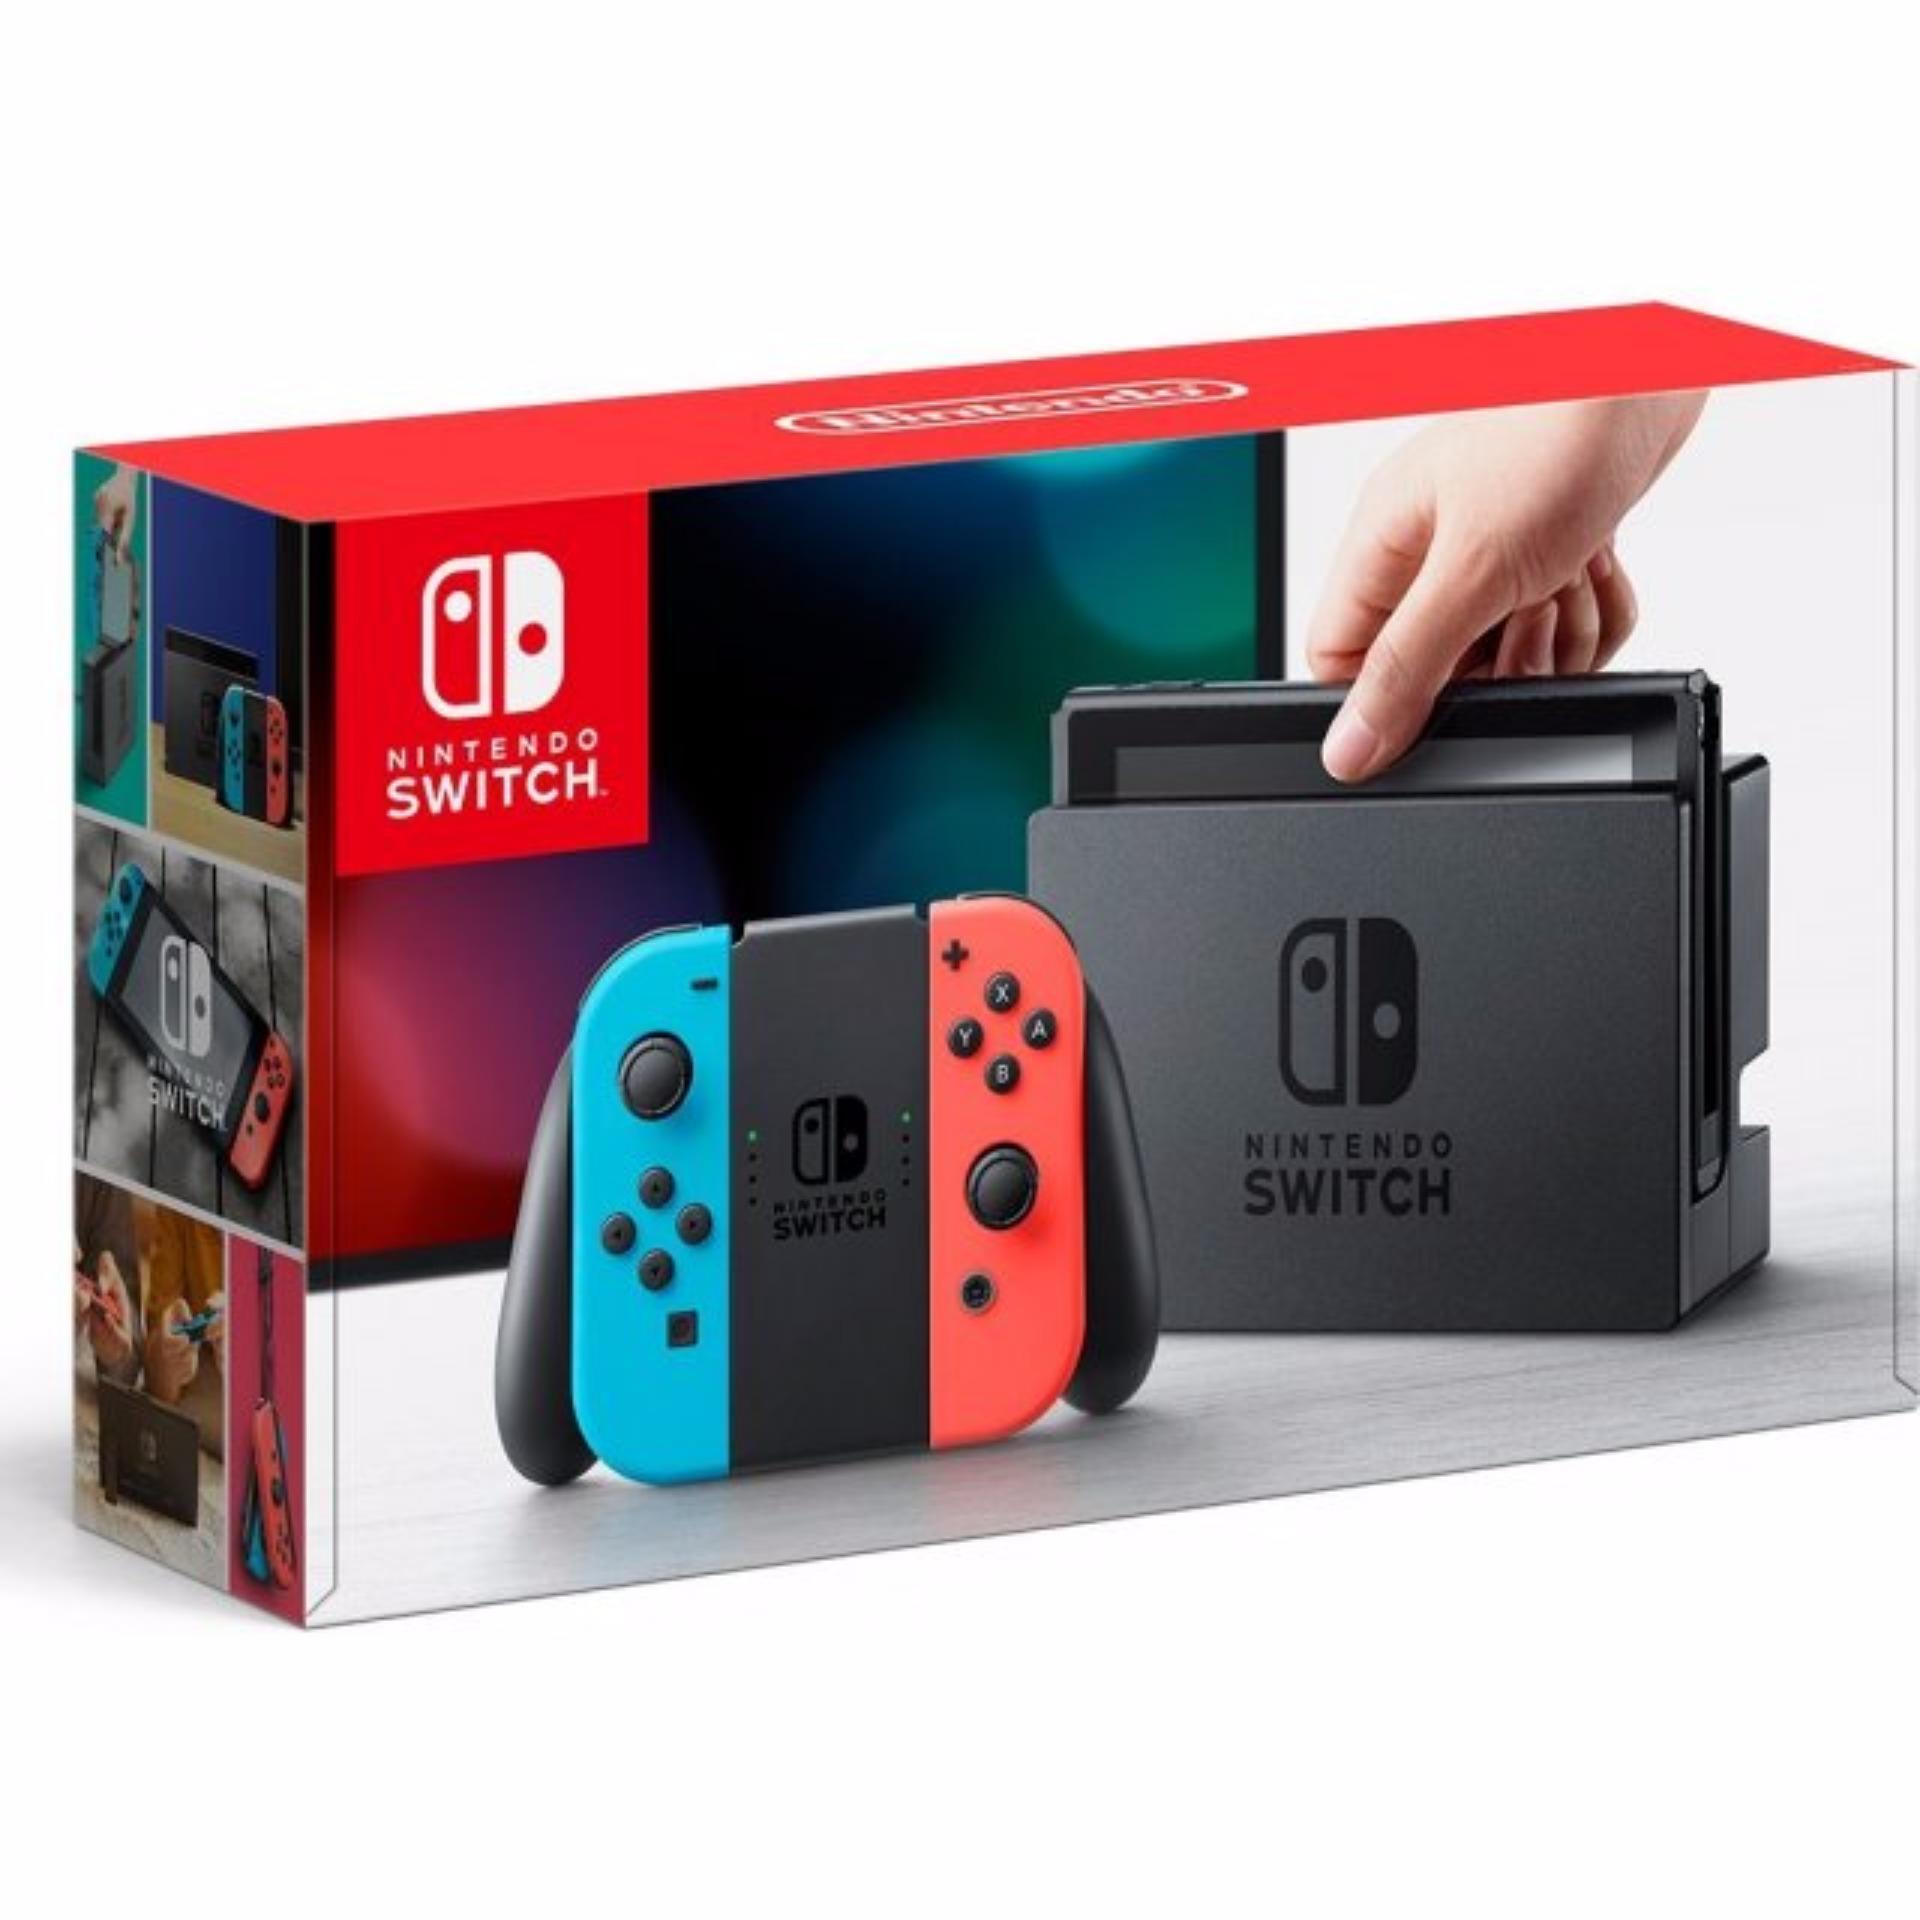 Nintendo Switch (Neon) (Local Set)